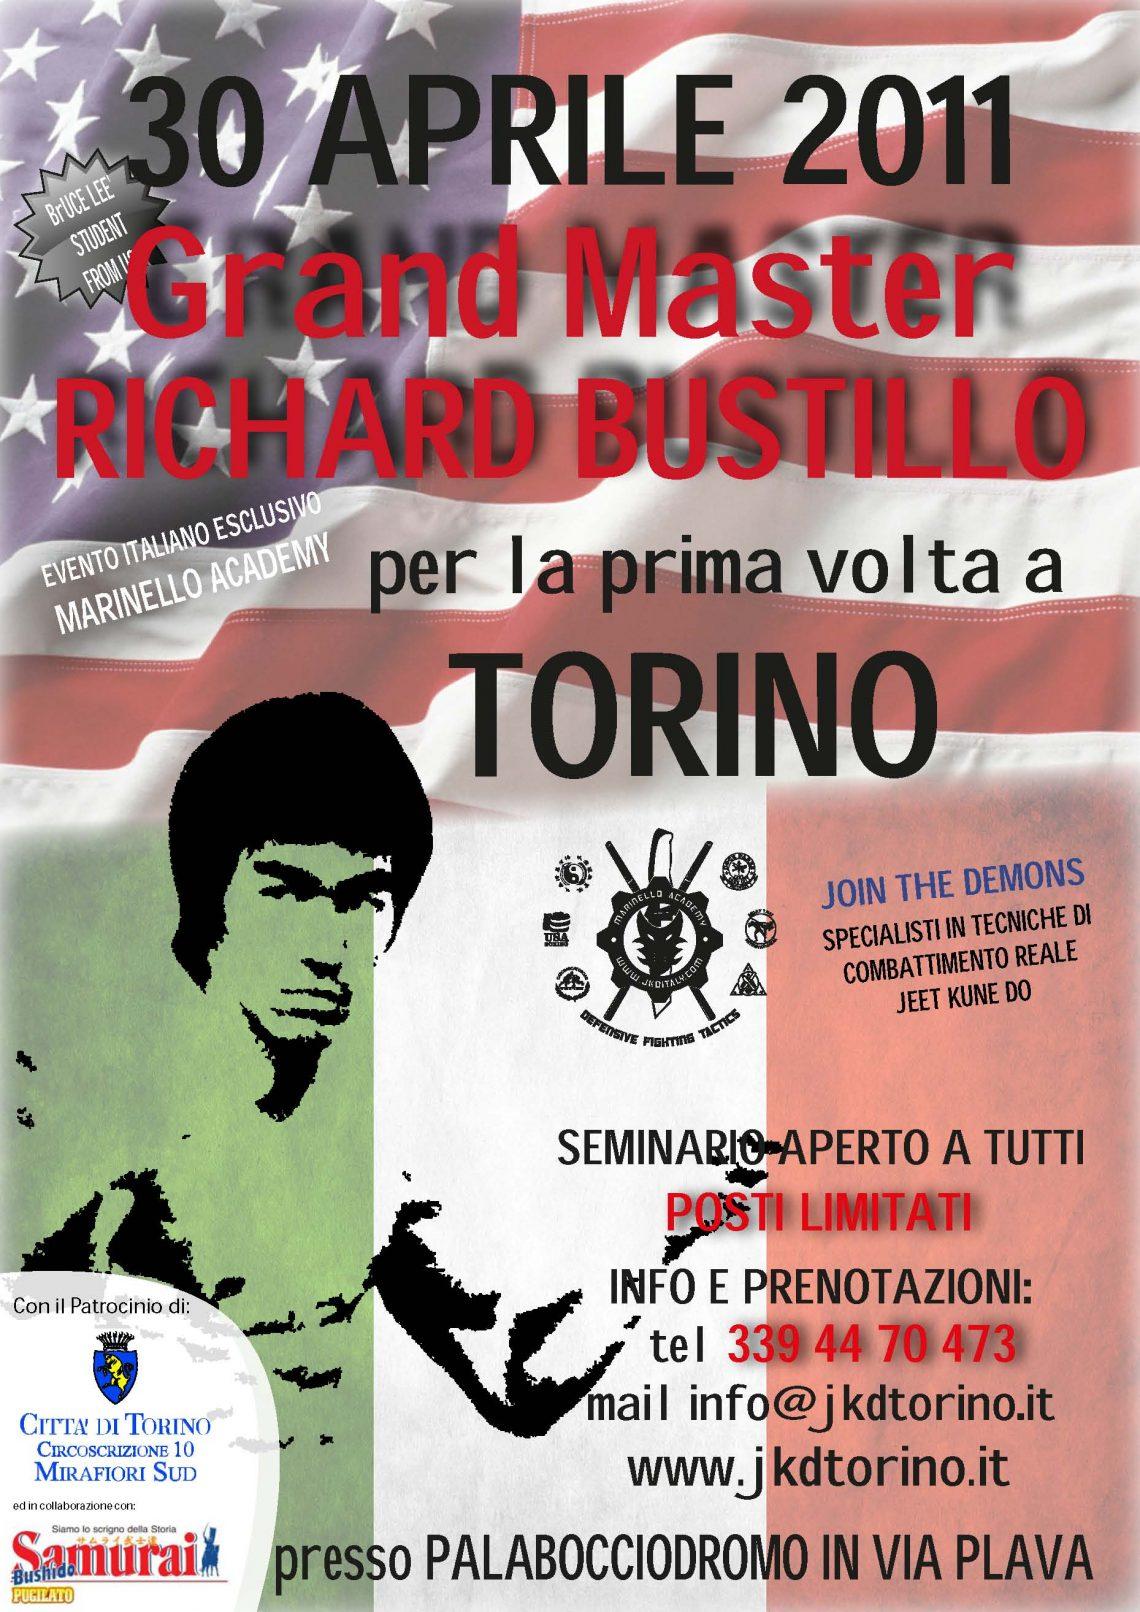 Richard Bustillo in Stage 1